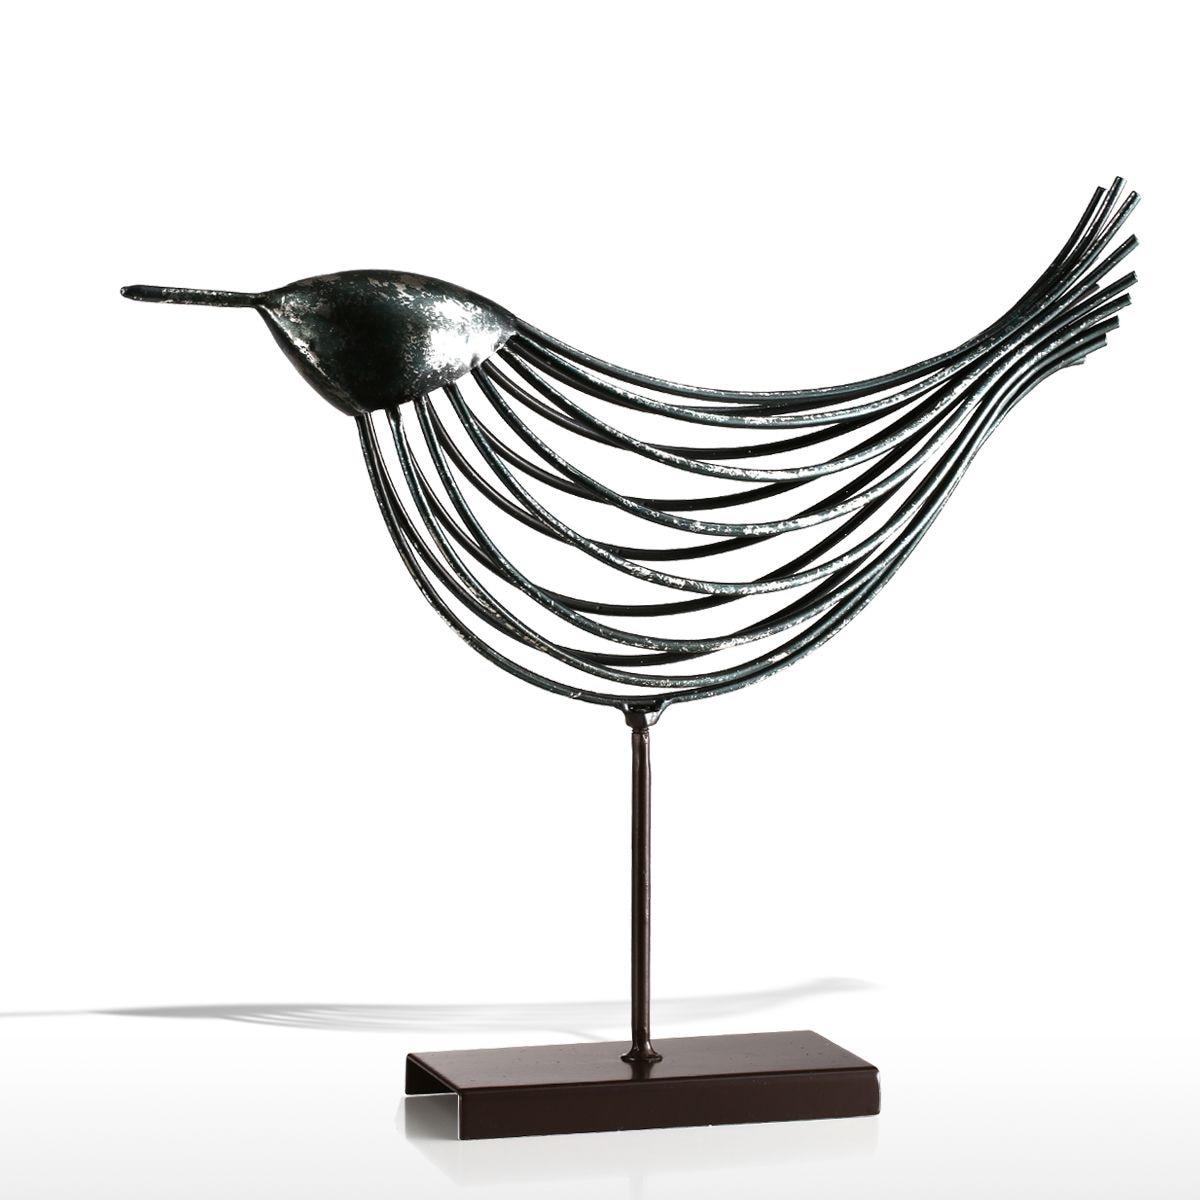 Tooarts Iron Wire Bird Tooarts Metal Sculpture Home Decoration Creative Sculpture Bird Table Home Table Decor Handmade Craft Statues Sculptures Aliexpress